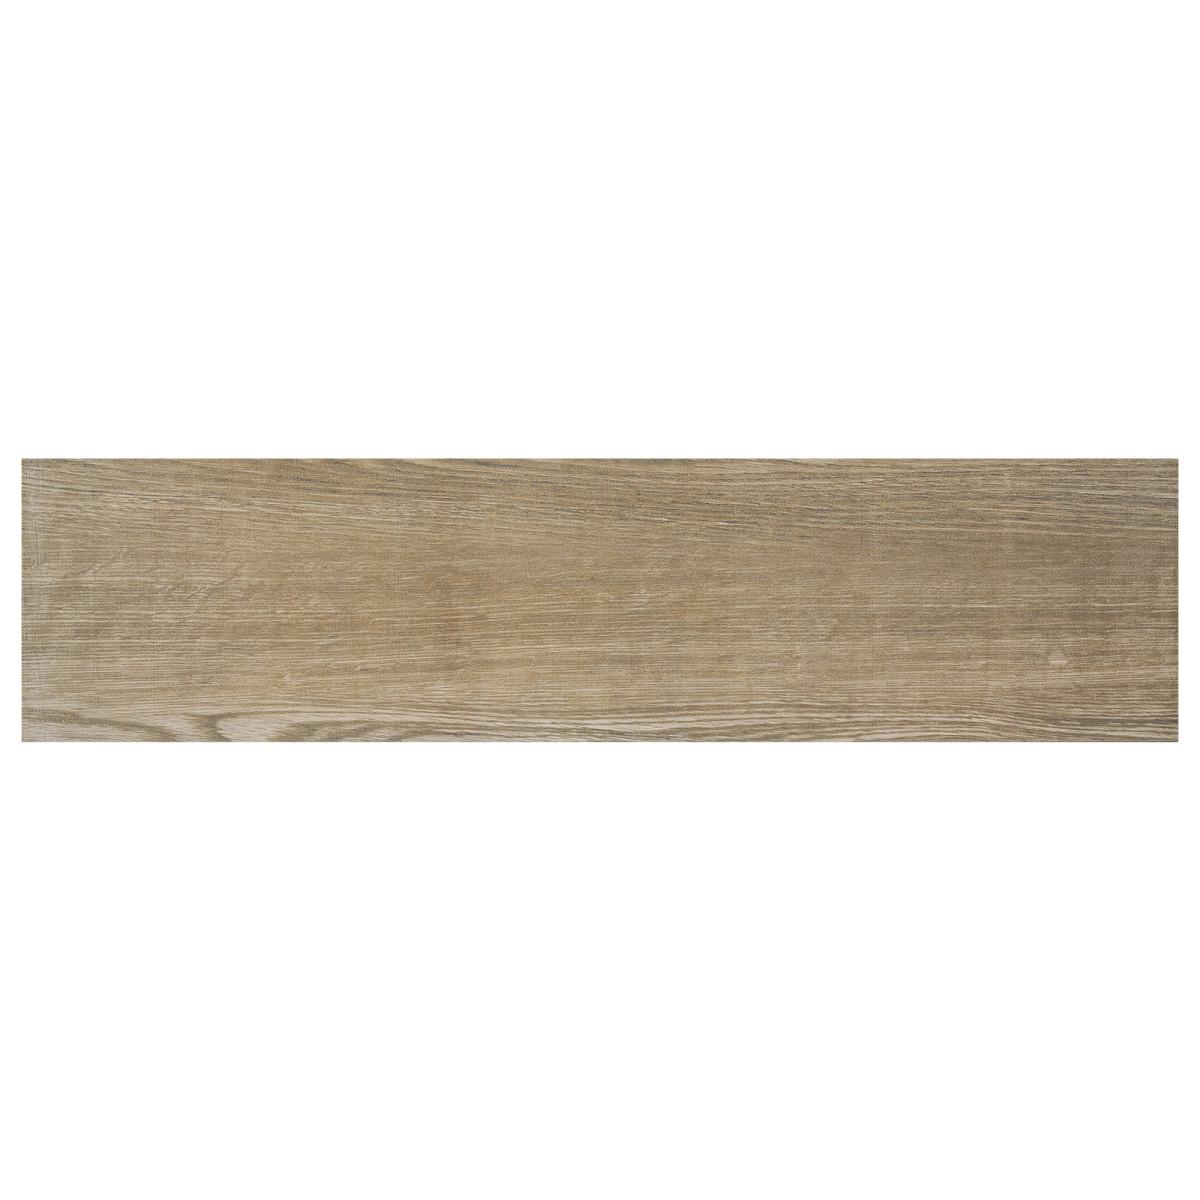 Керамогранит Artens Бисон цвет дымчатый 15х60 см